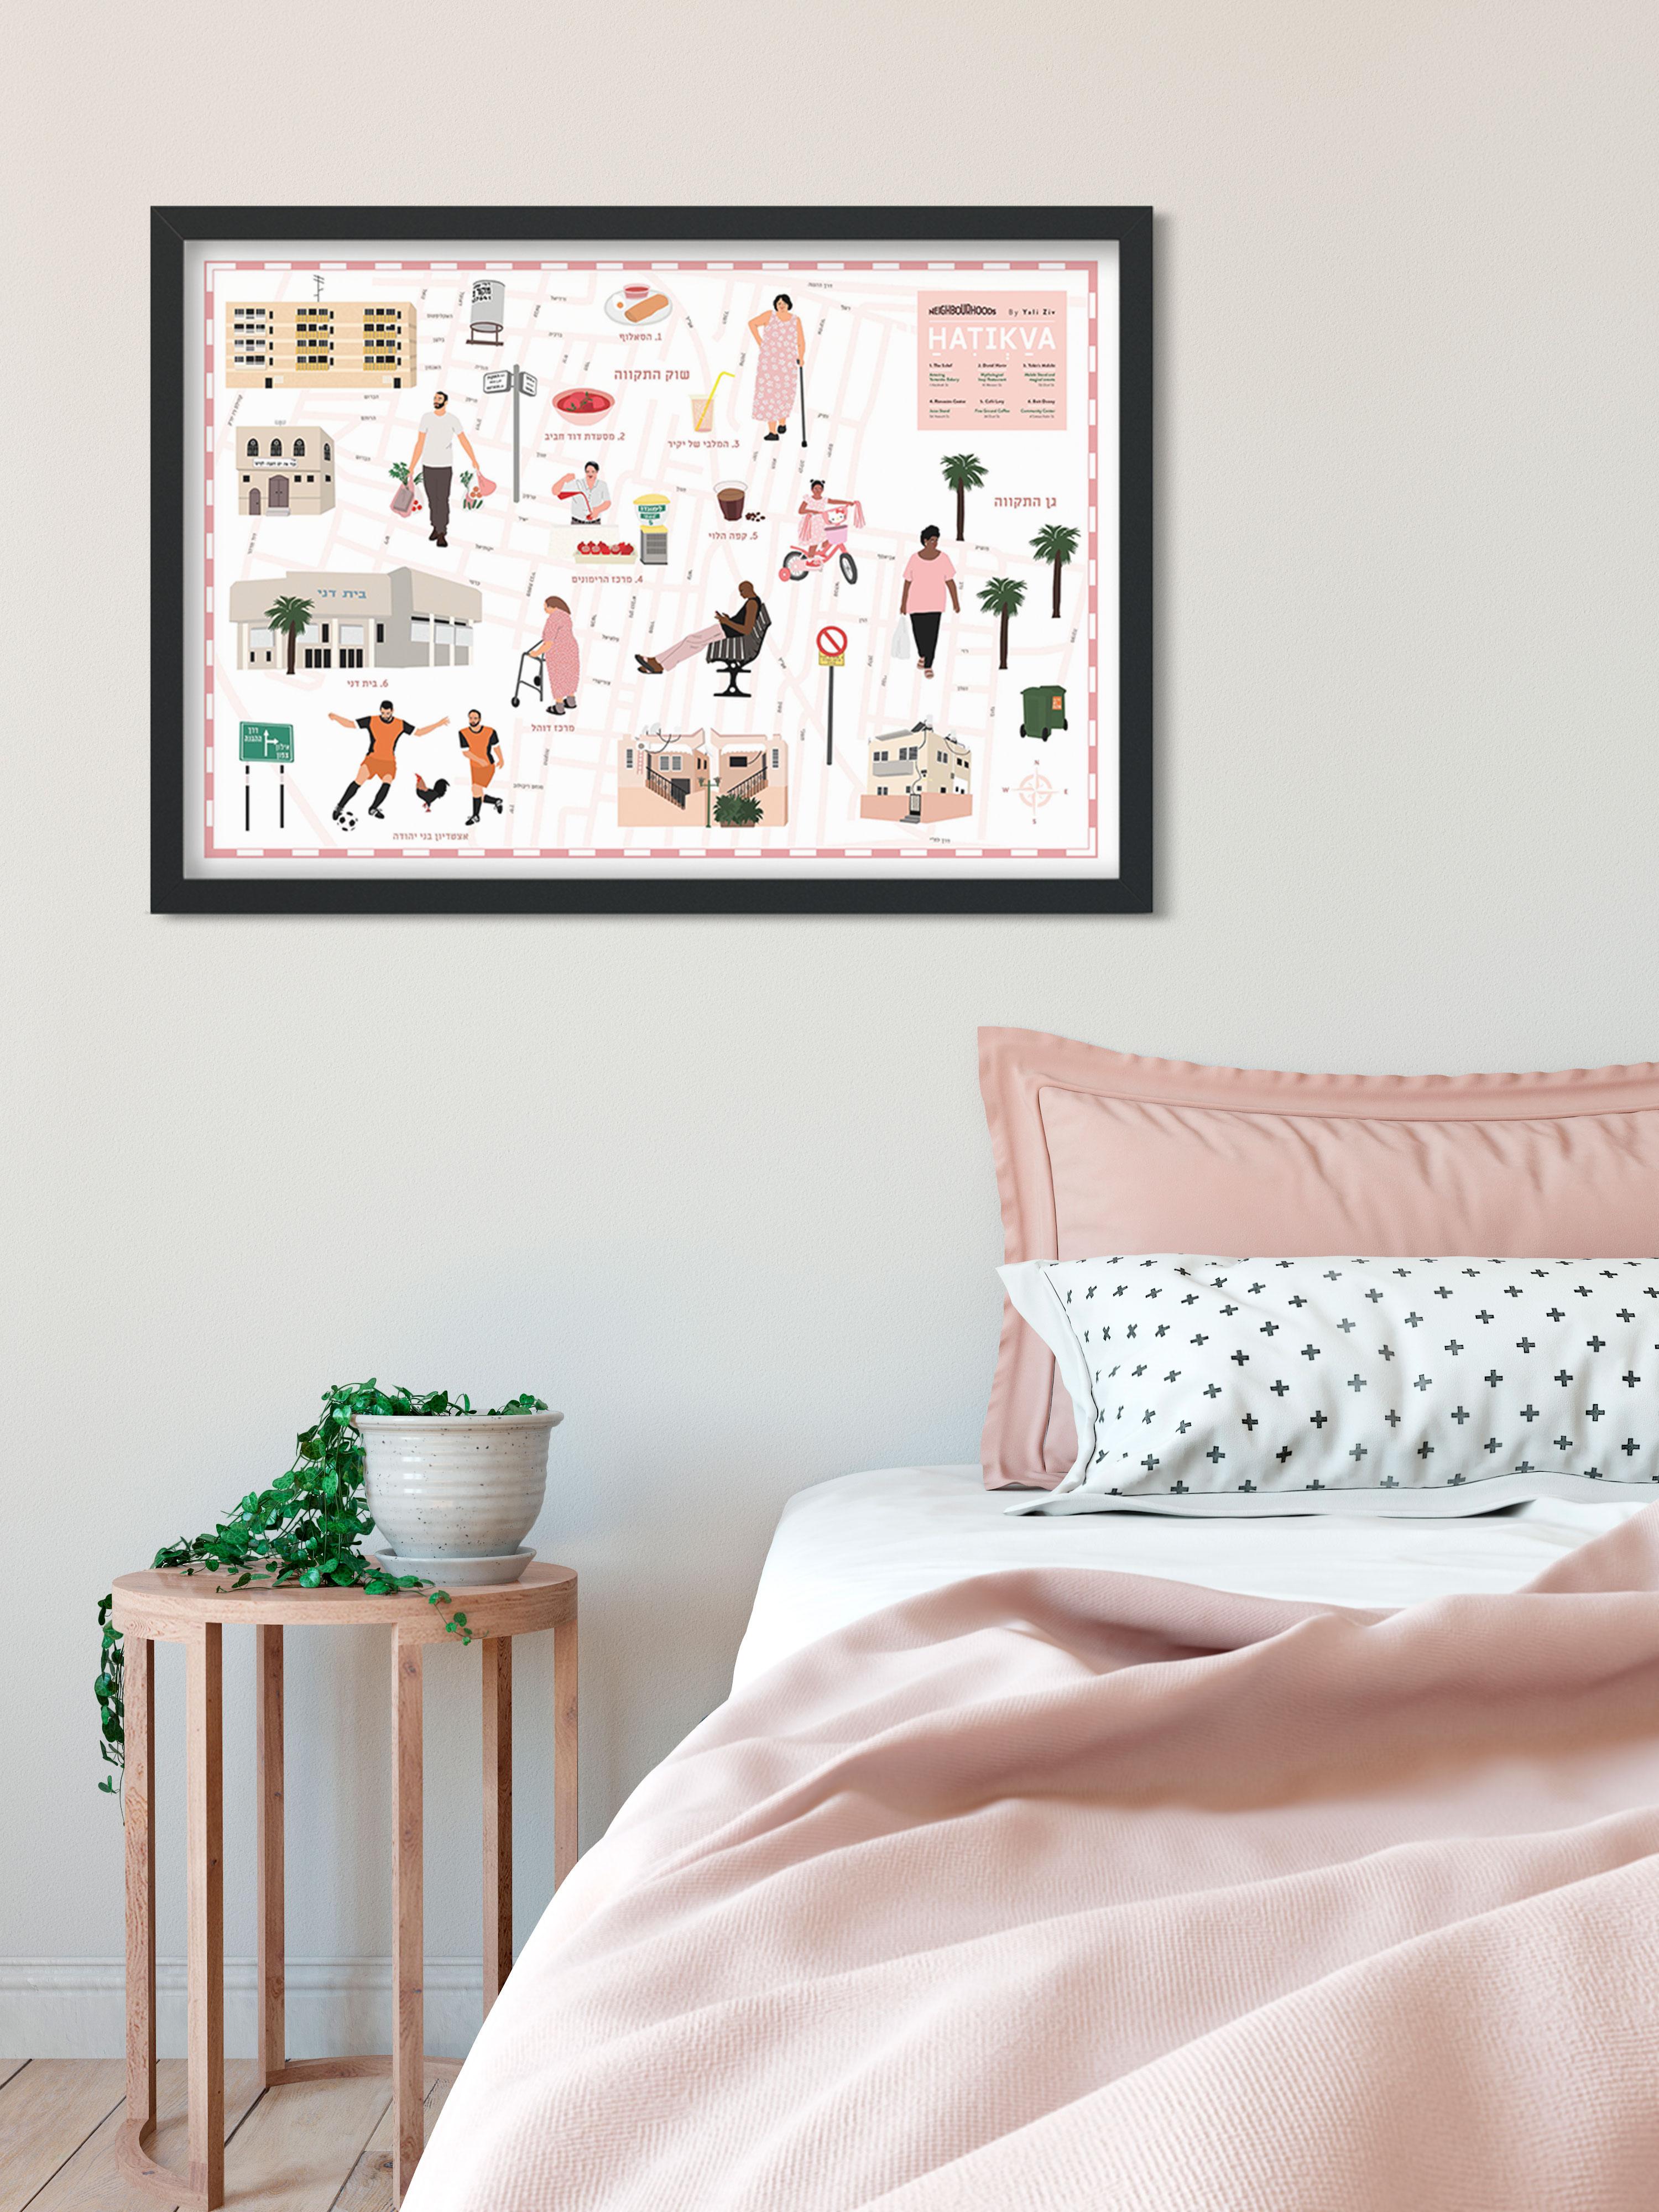 יהלי-חדר-שינה